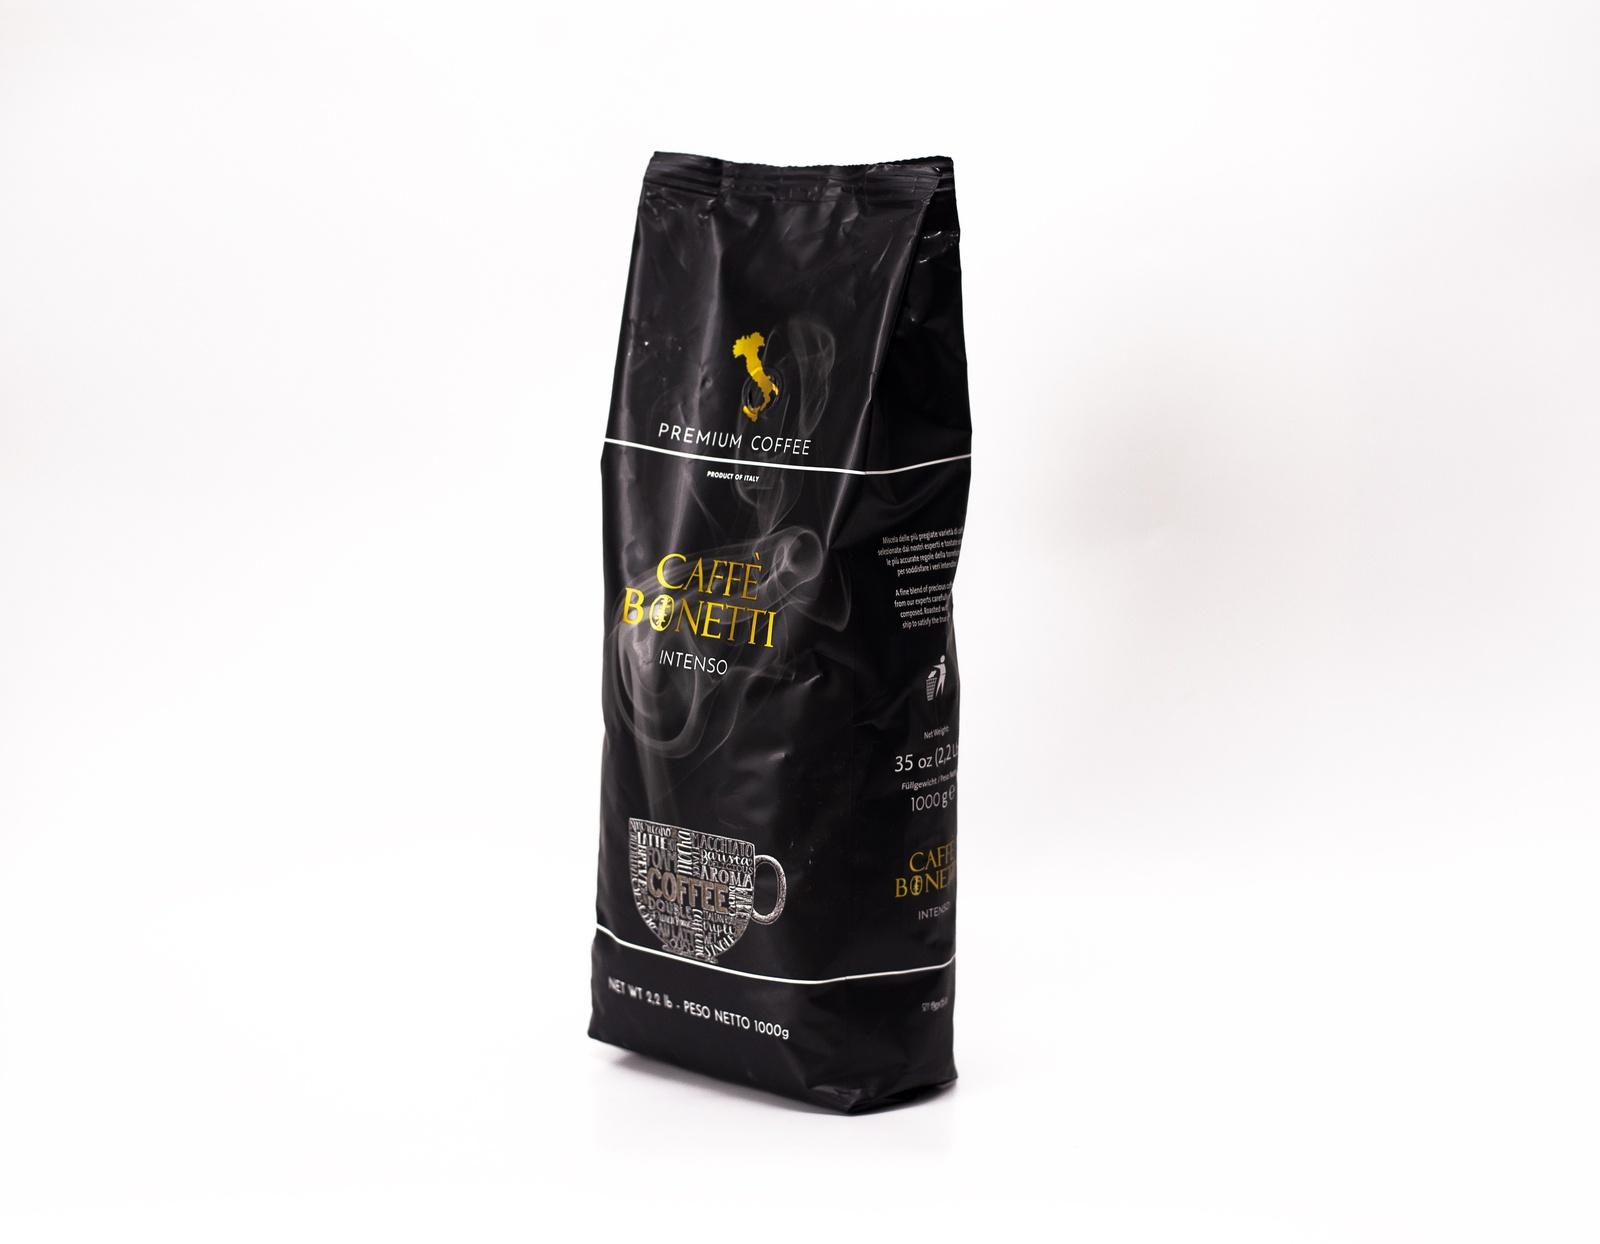 Кофе в зернах Caffe BONETTI кофе manuel кофе в зернах manuel caffe manuel degusto банка 2 кг